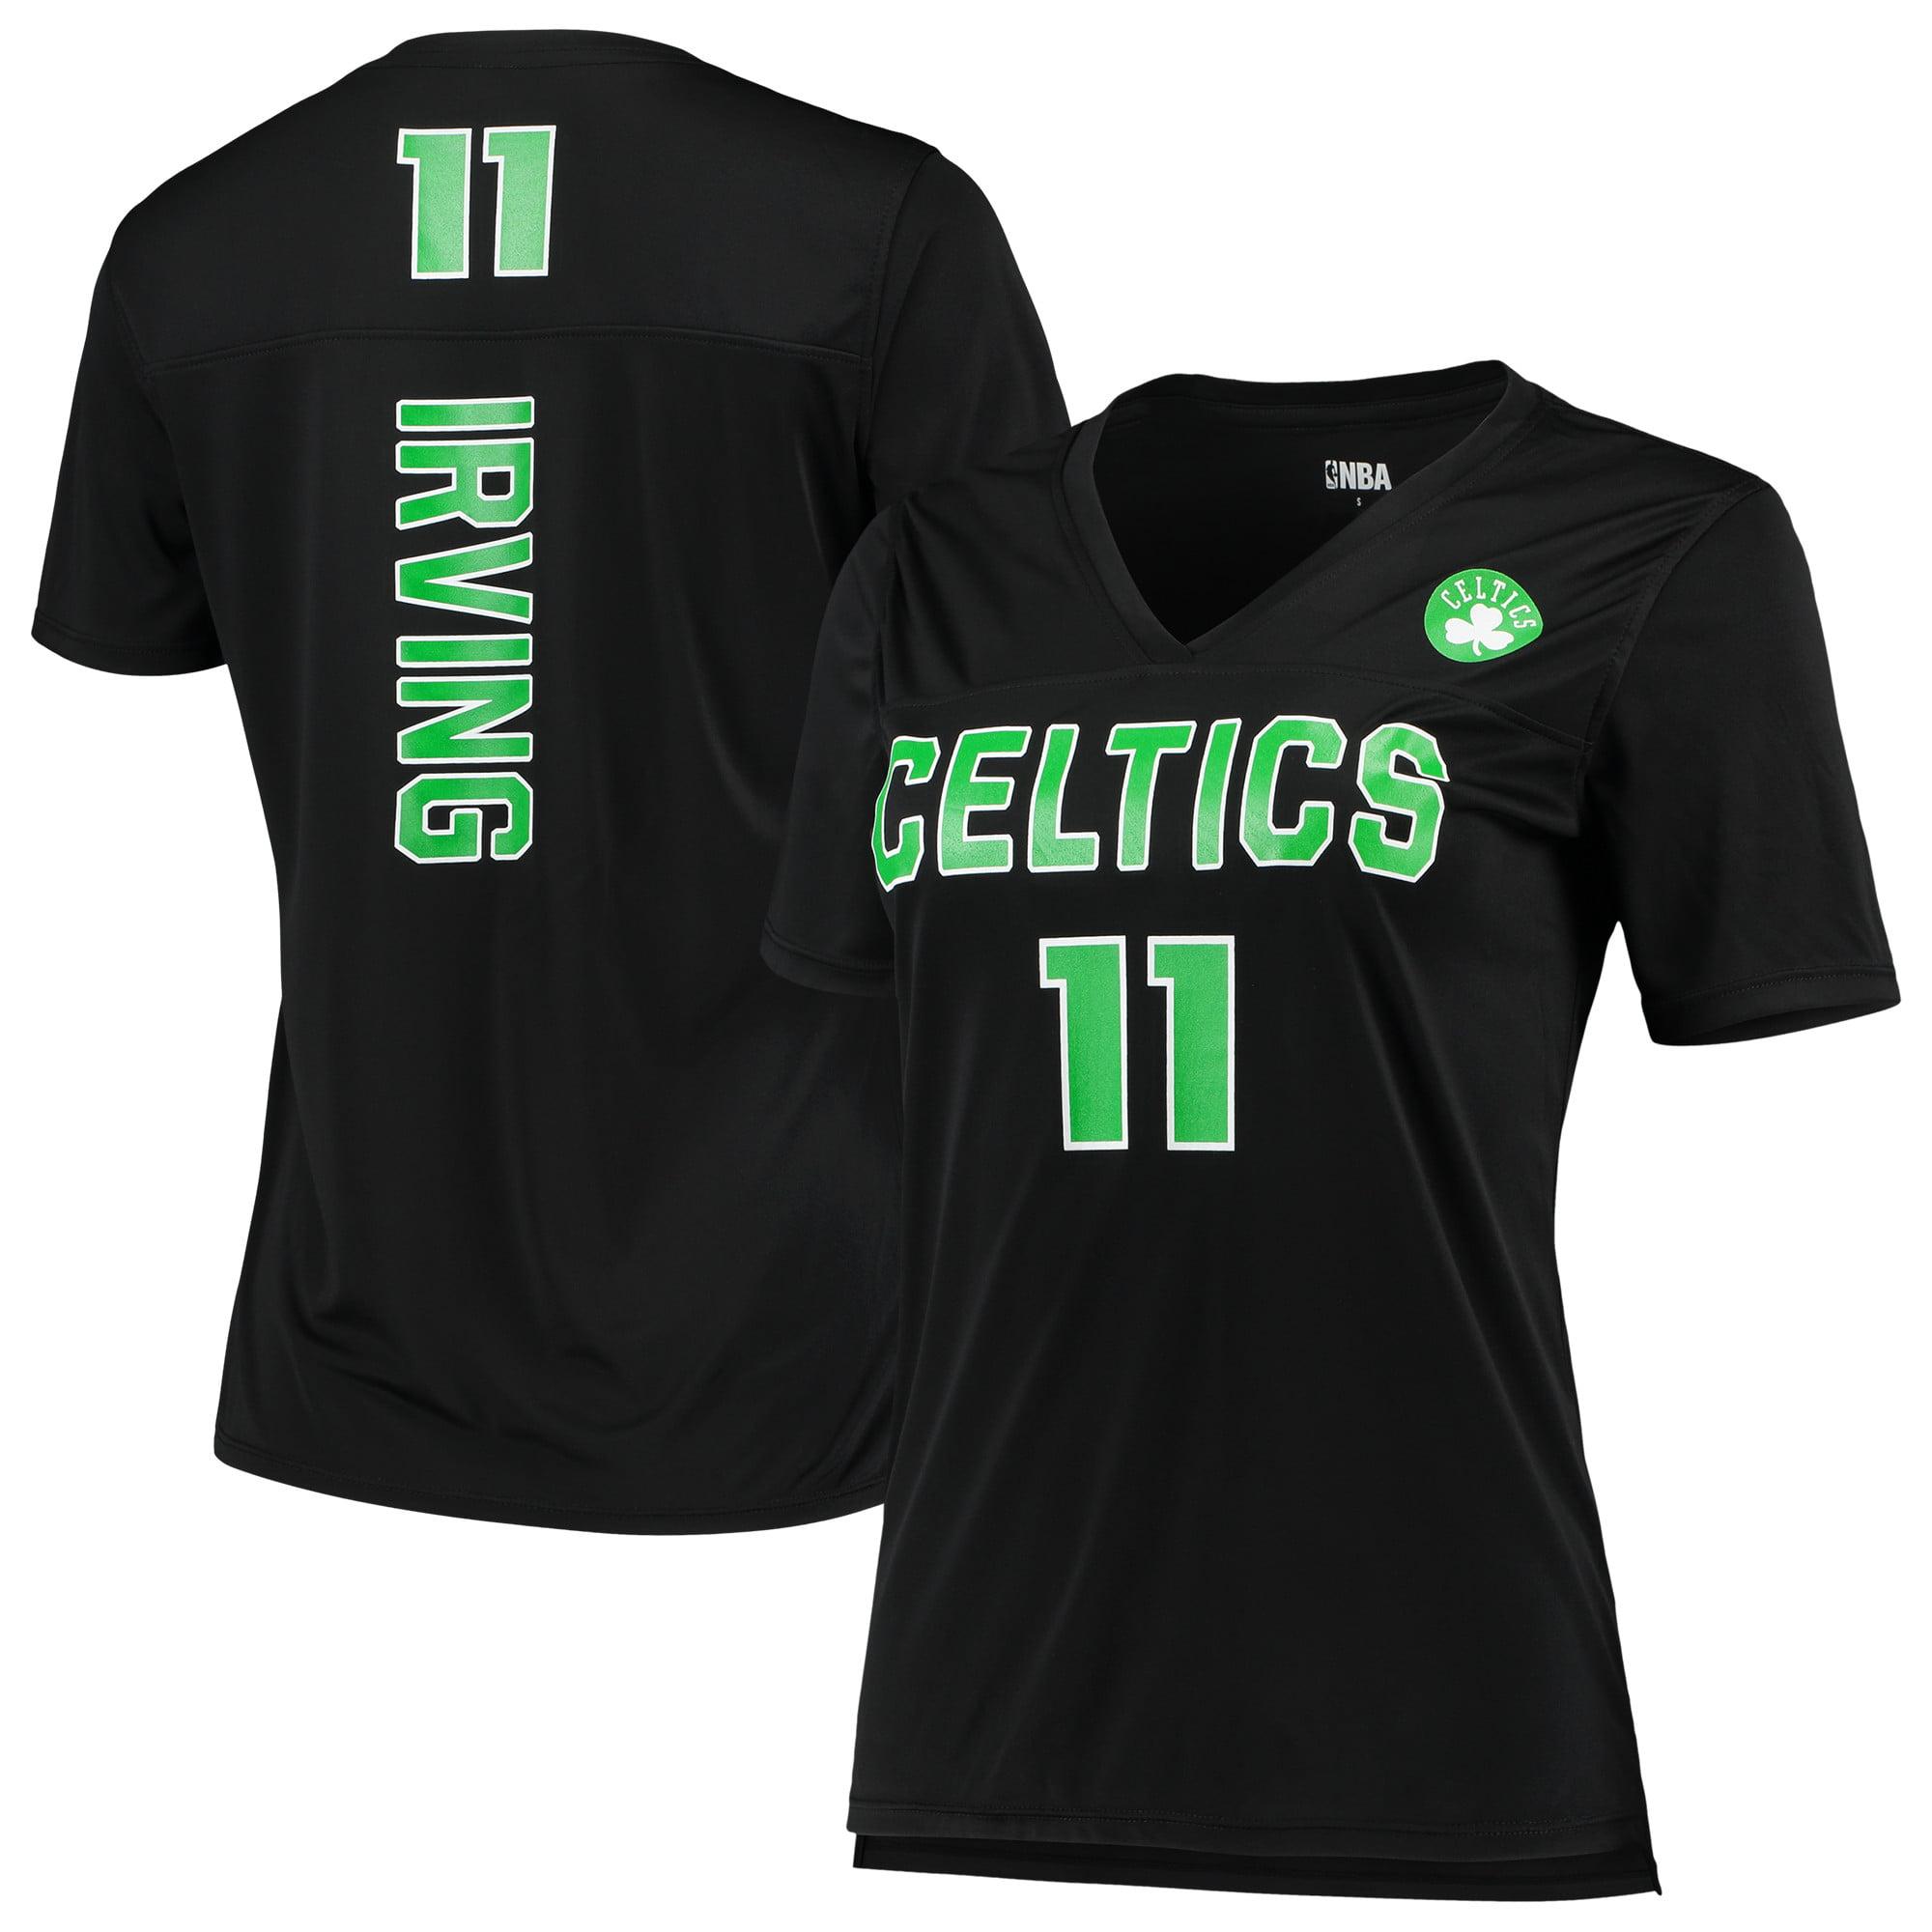 Women's 5th & Ocean by New Era Kyrie Irving BlackBoston Celtics Name and Number T-Shirt